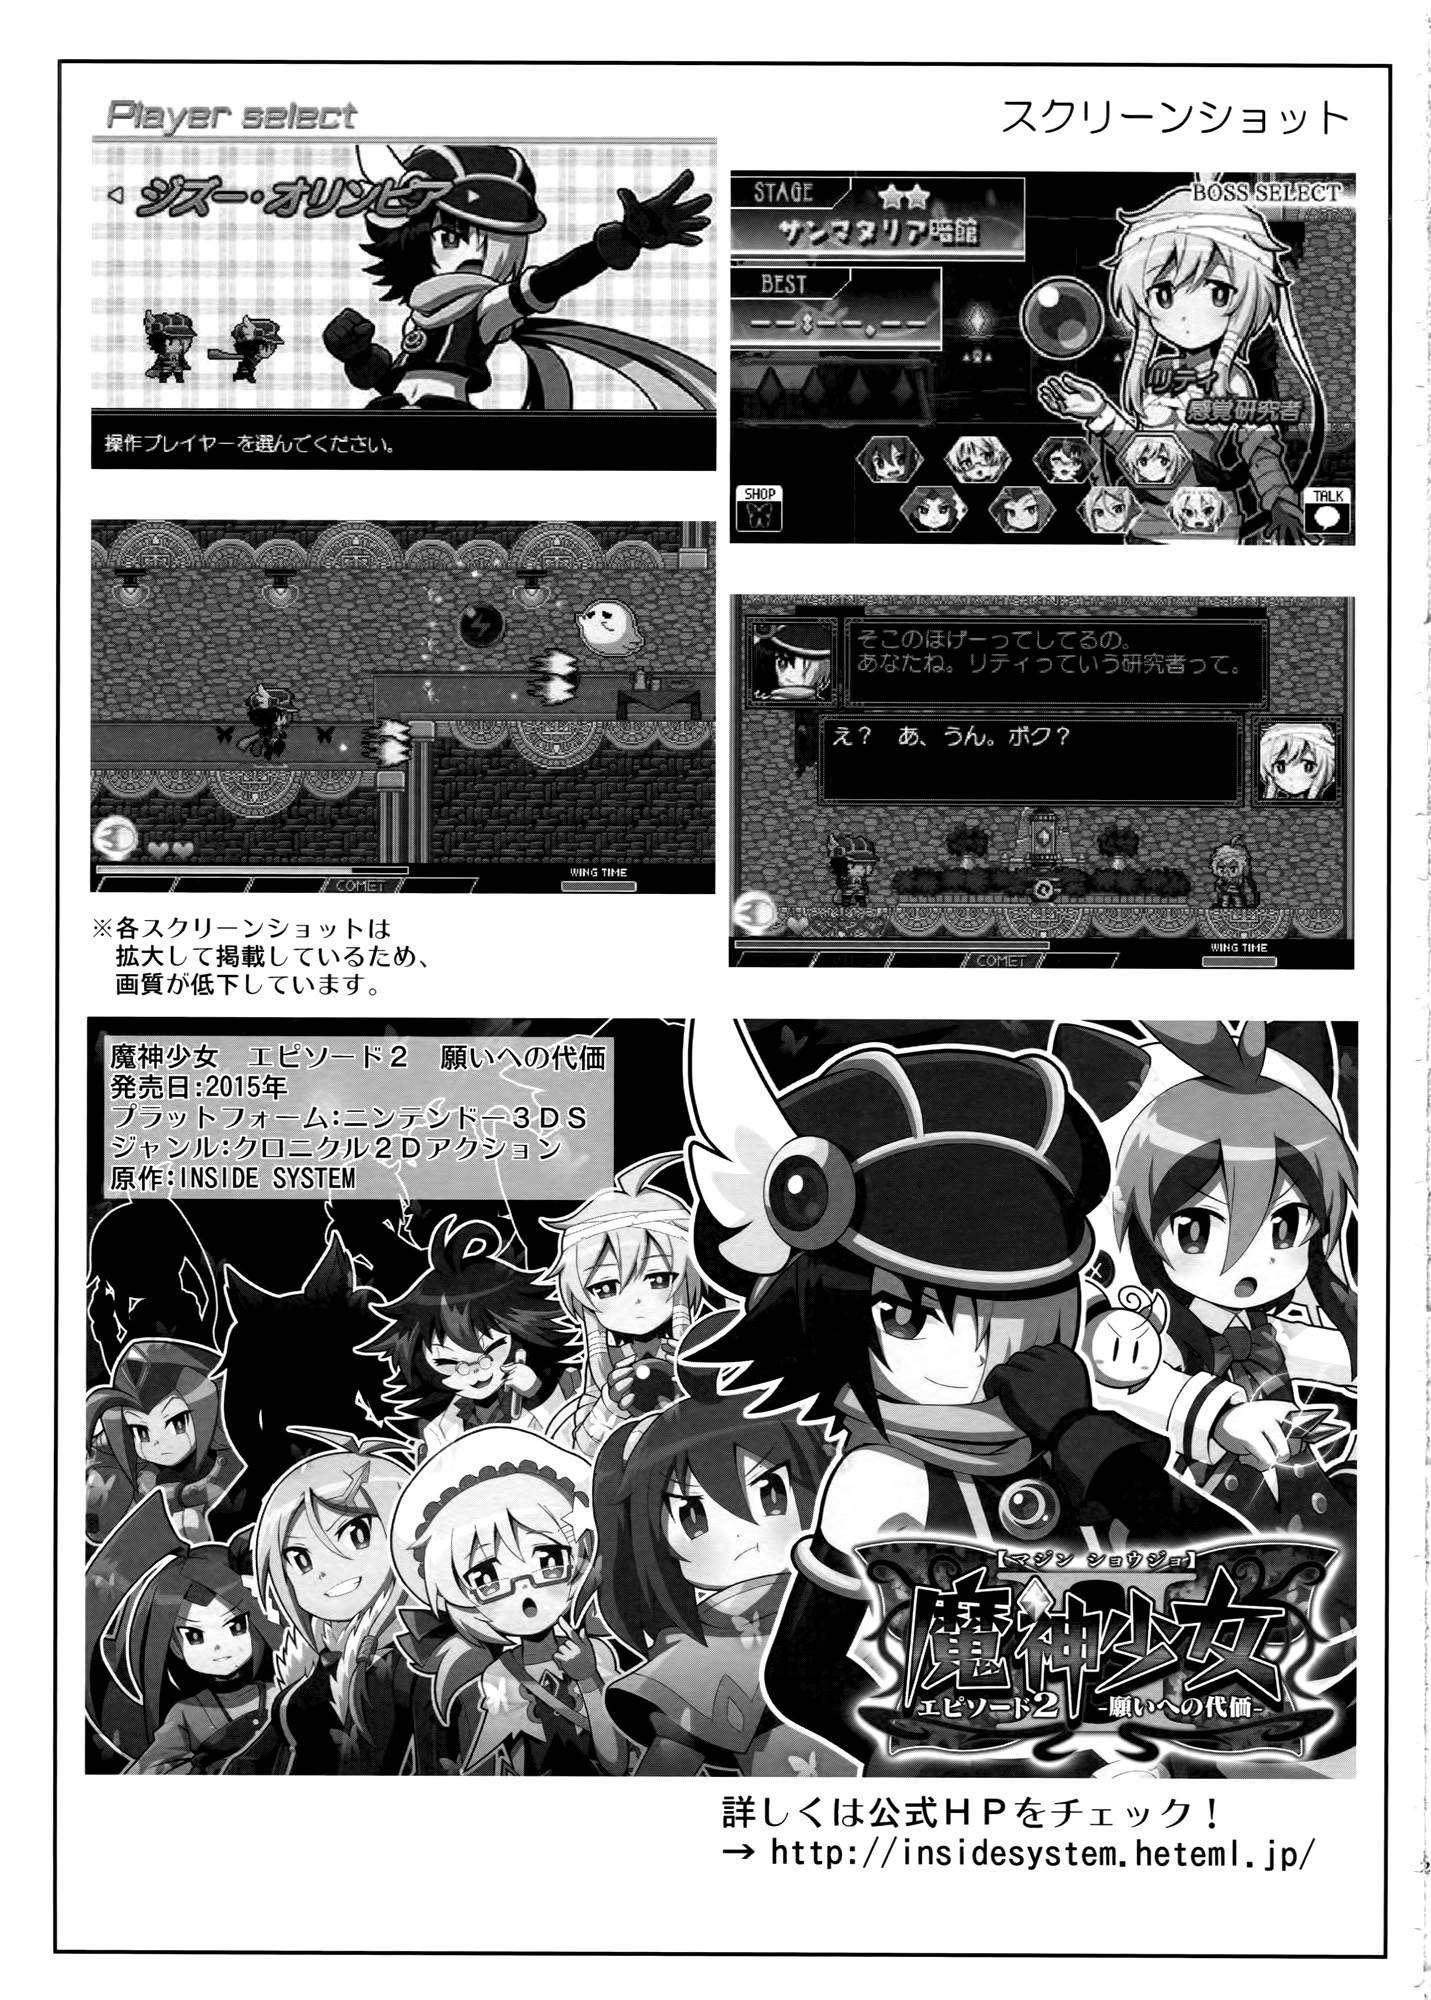 Takao Onee-san to Nyuukyo! Kai Ni Chapter-1 - 20